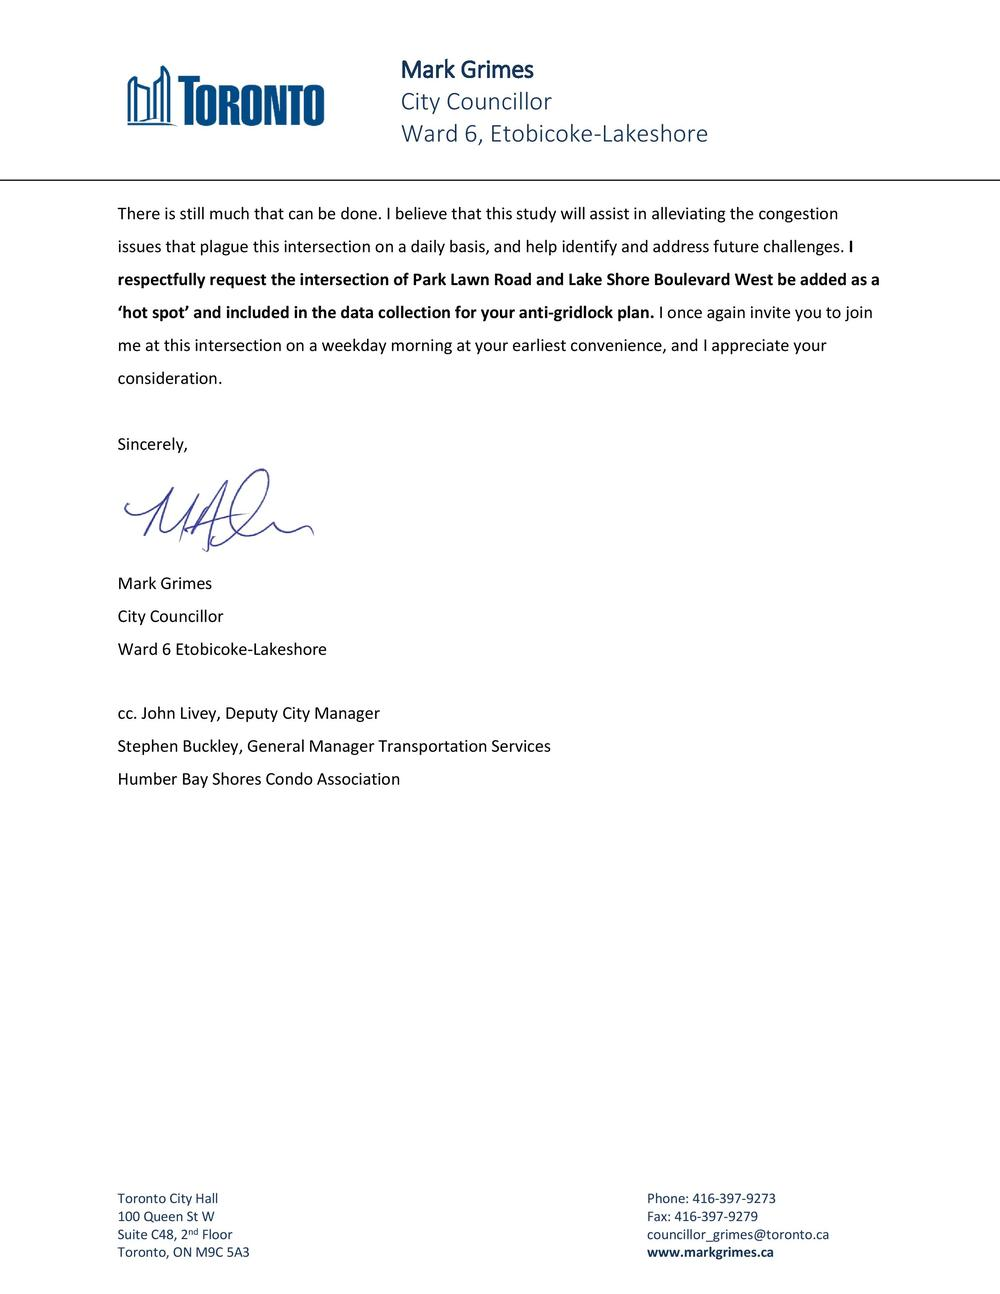 Letter_John_Tory_ParkLawn_LSBW_Hot_Spot-page-003-1.jpg